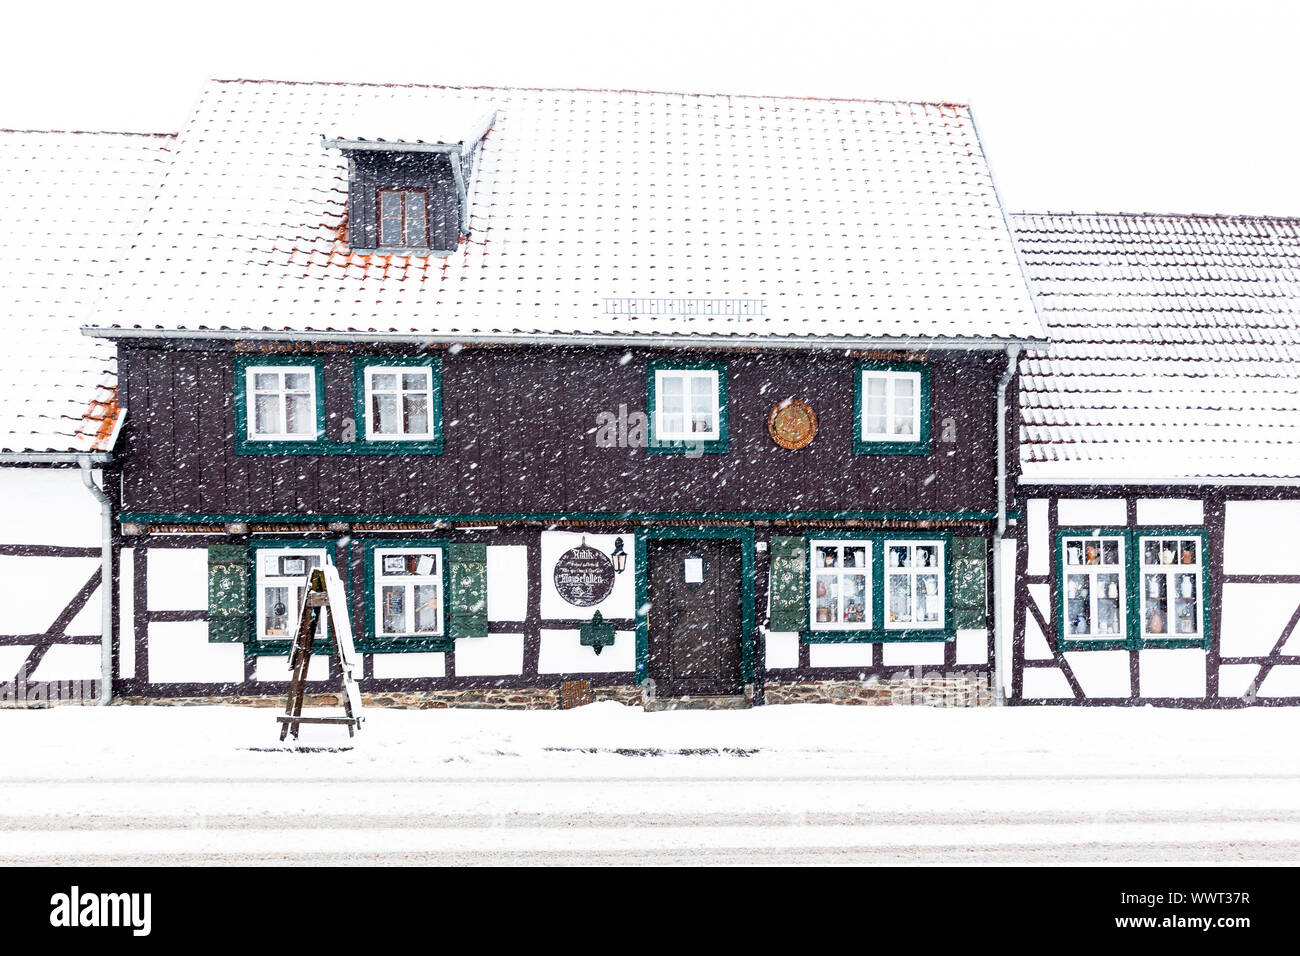 Museo Mausefallen Güntersberge en invierno Foto de stock